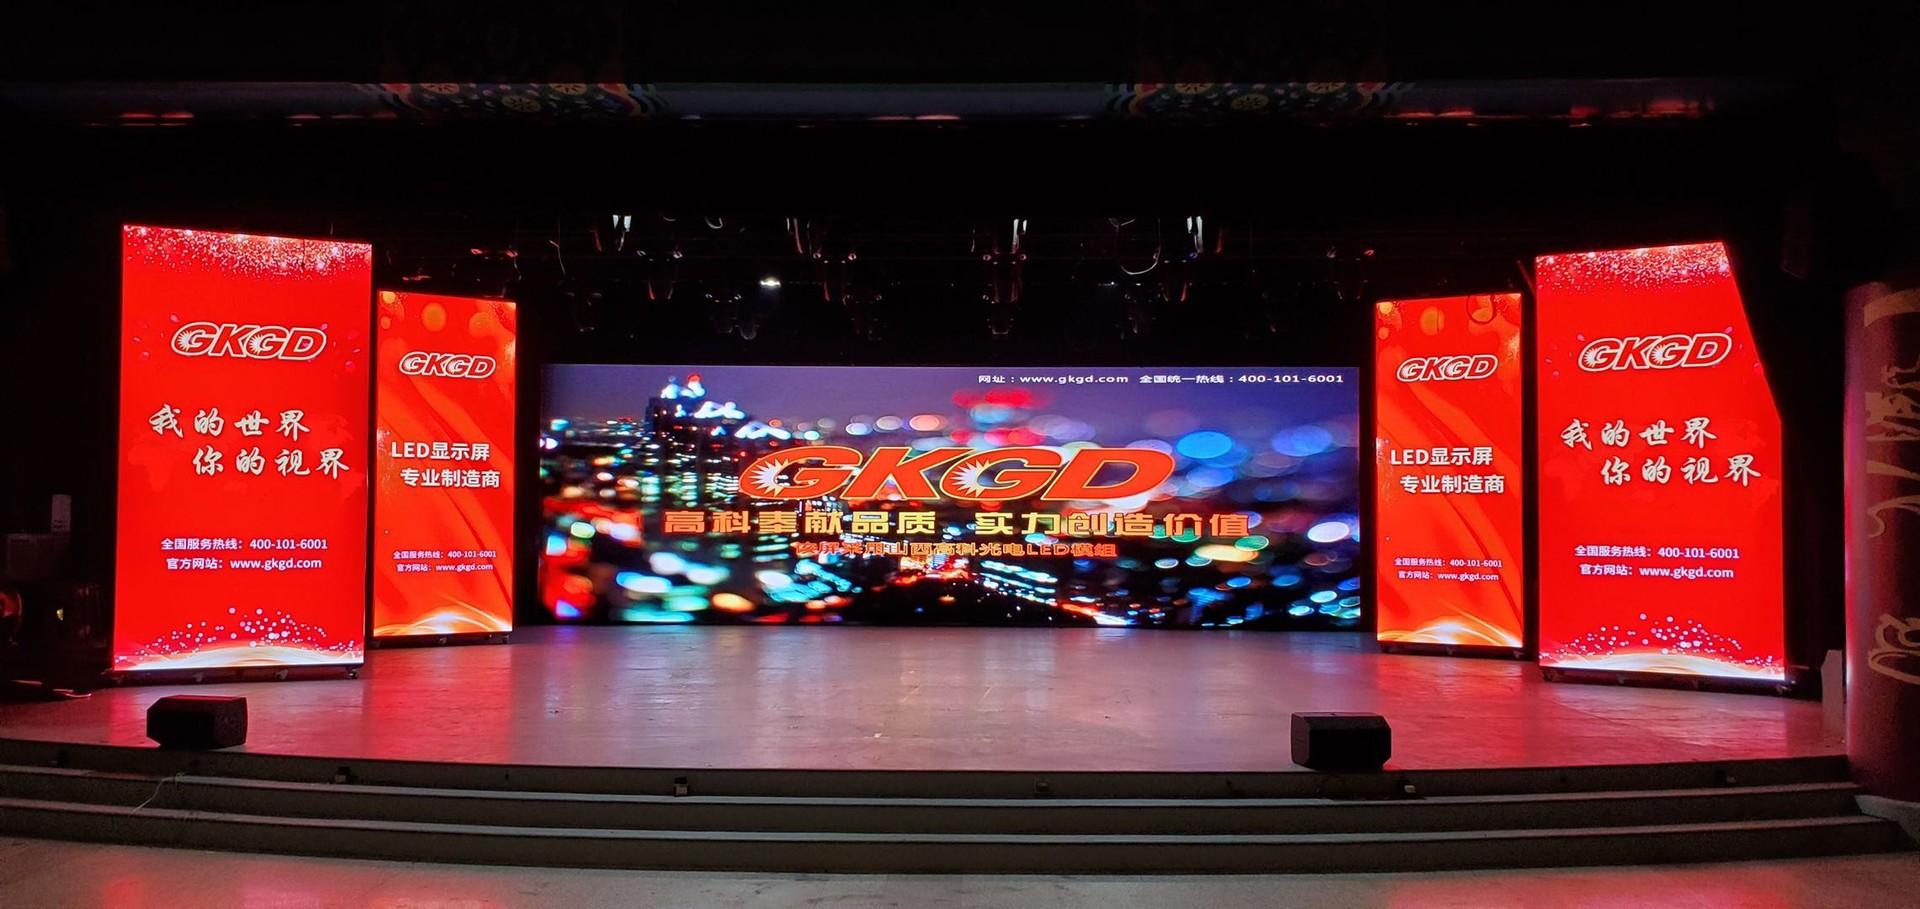 P1.53 Indoor Stage Performance Background Display